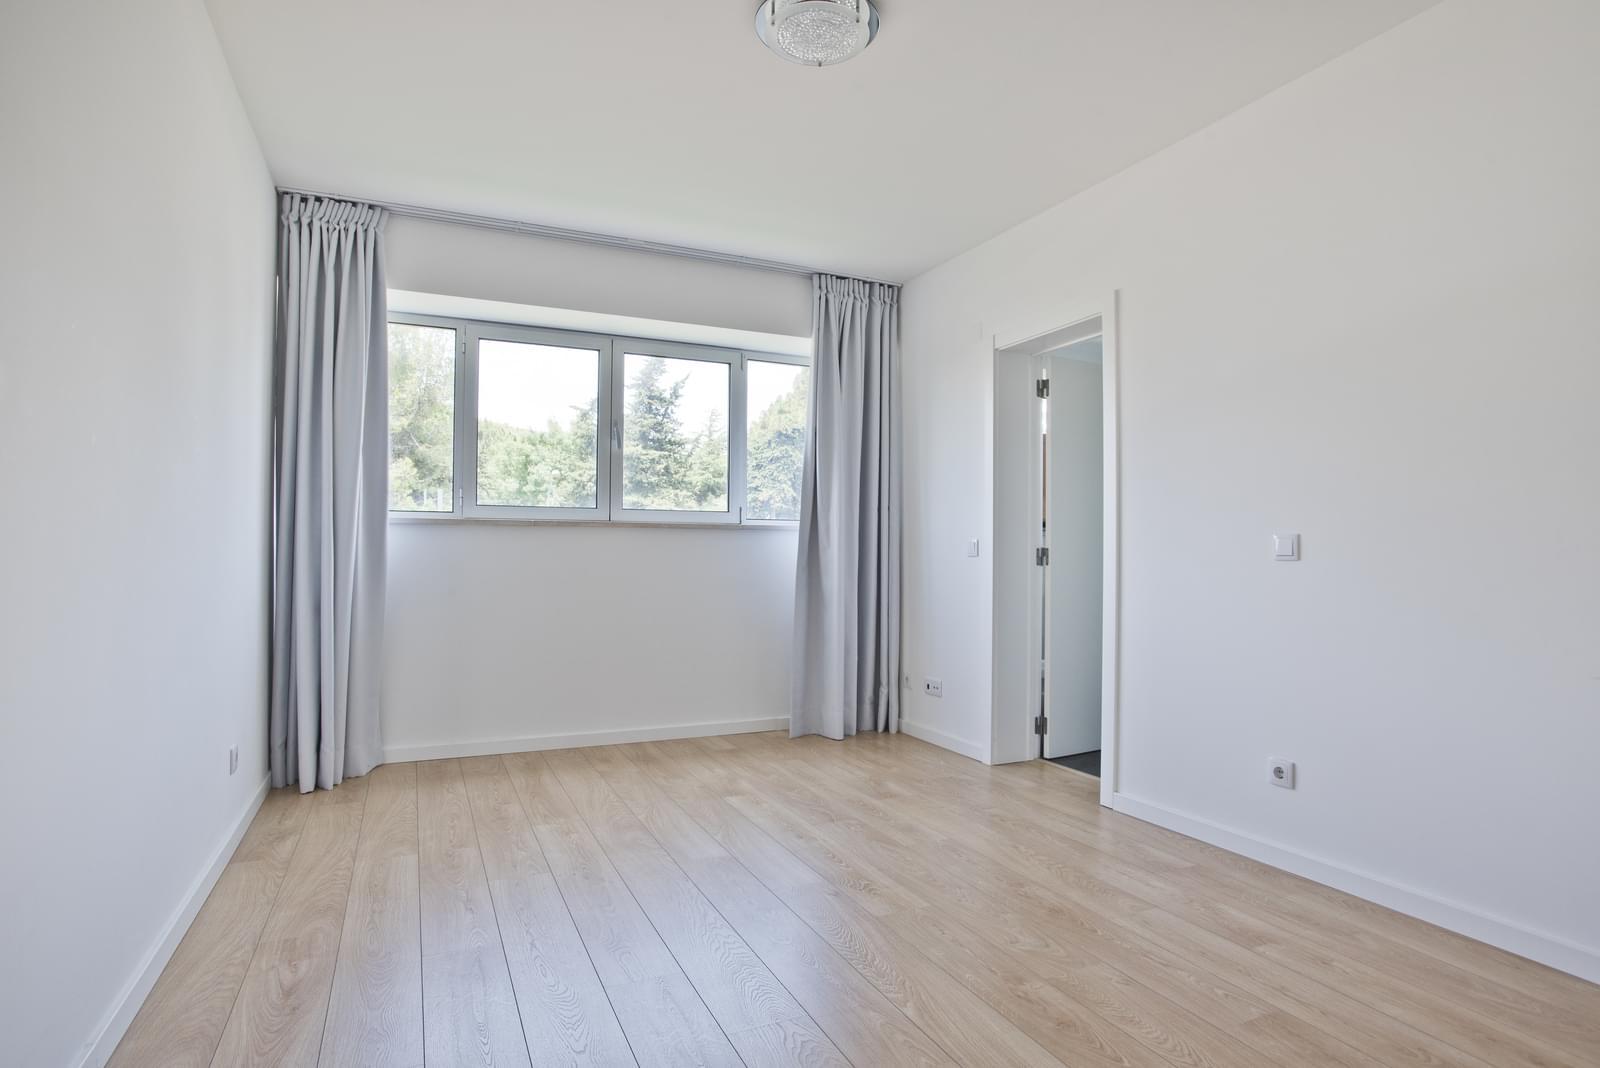 pf13975-apartamento-t4-oeiras-d310df50-121d-496b-b60e-57968388a780